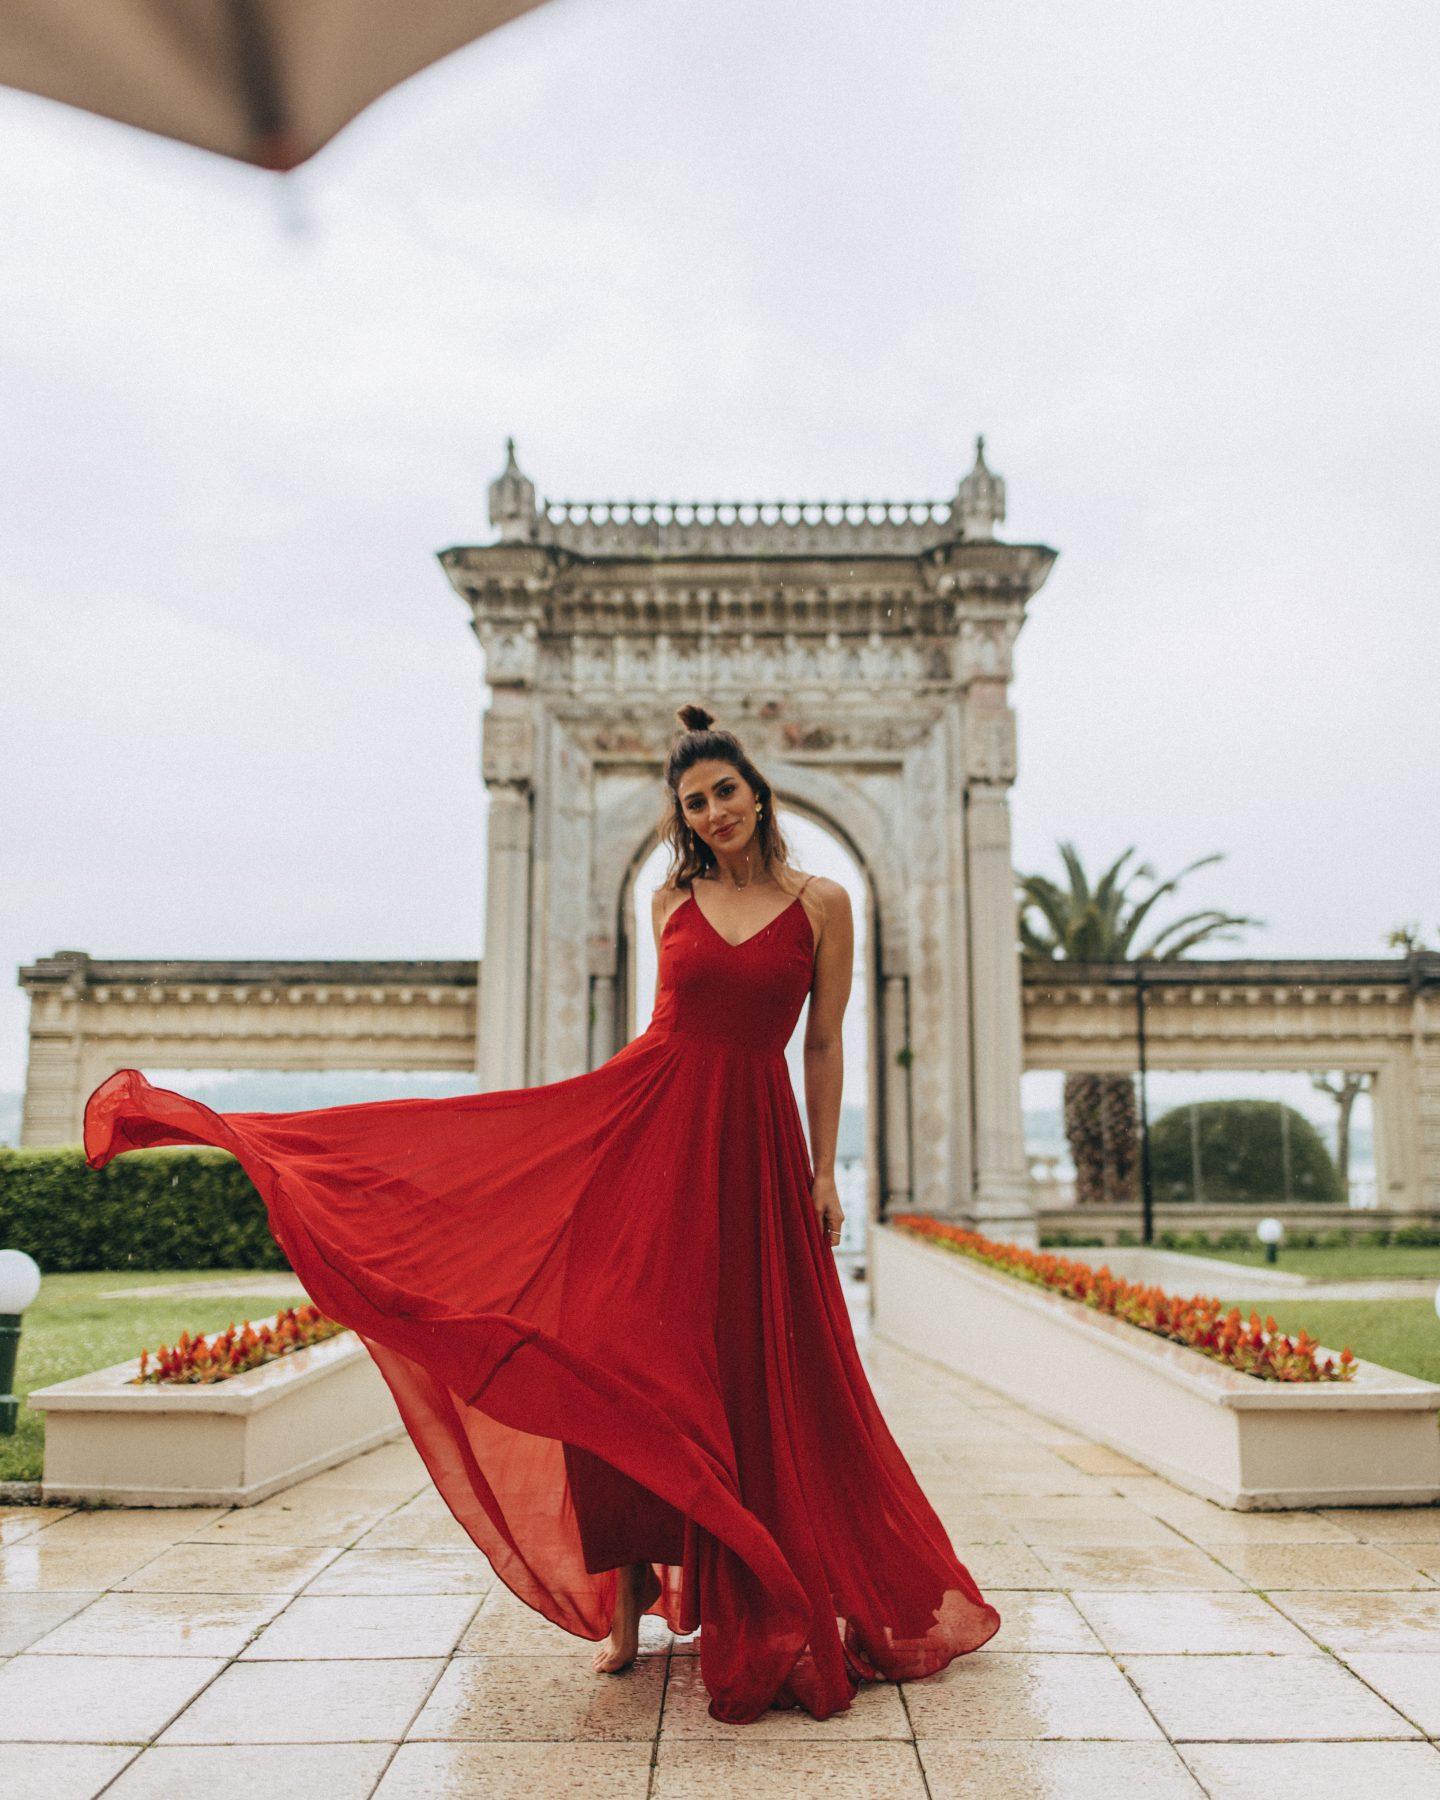 A woman twirls her dress at Ciragan Palace Kempinski Istanbul